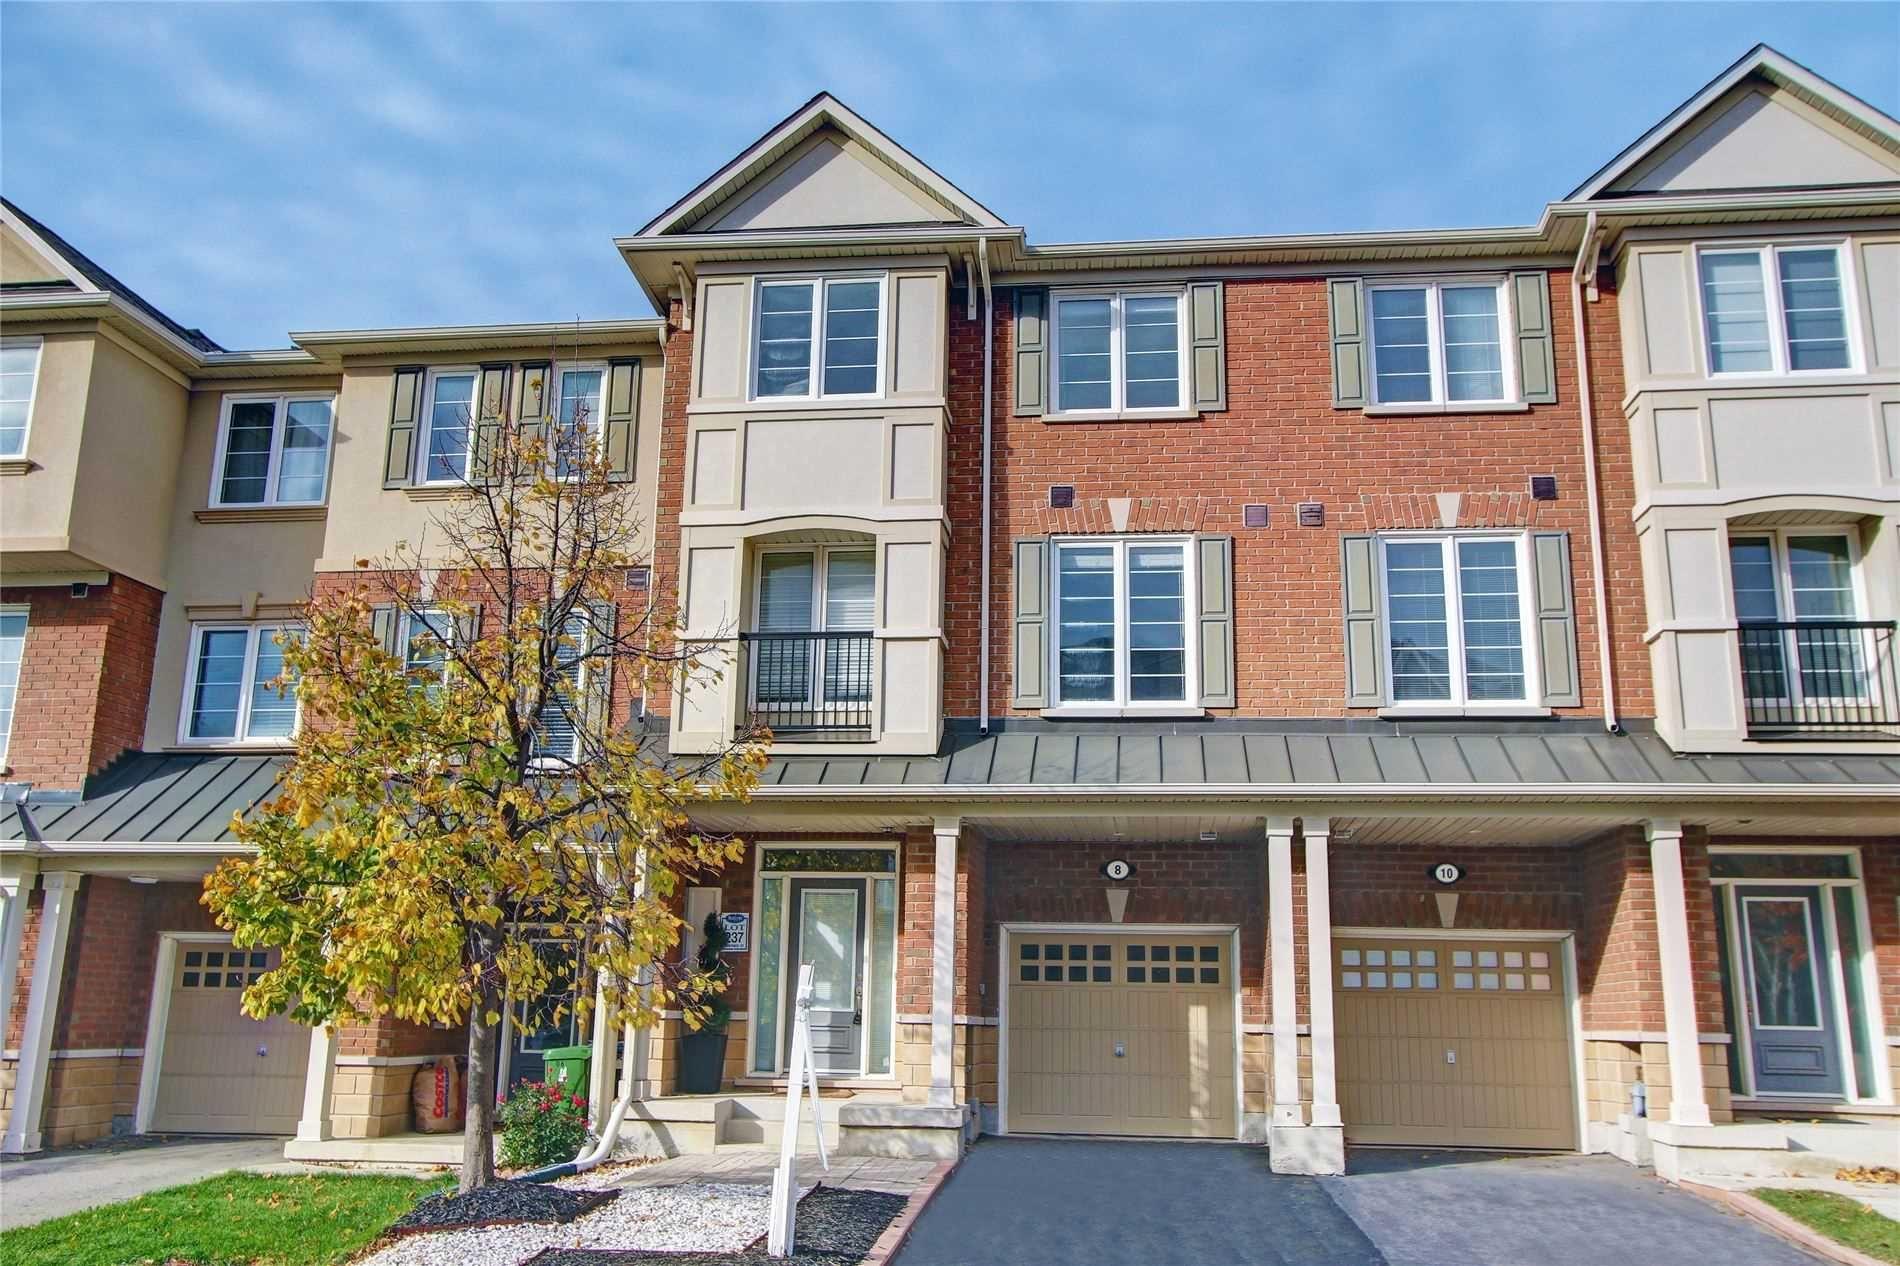 Main Photo: 8 Pethick Street in Toronto: Clairlea-Birchmount House (3-Storey) for sale (Toronto E04)  : MLS®# E4628913